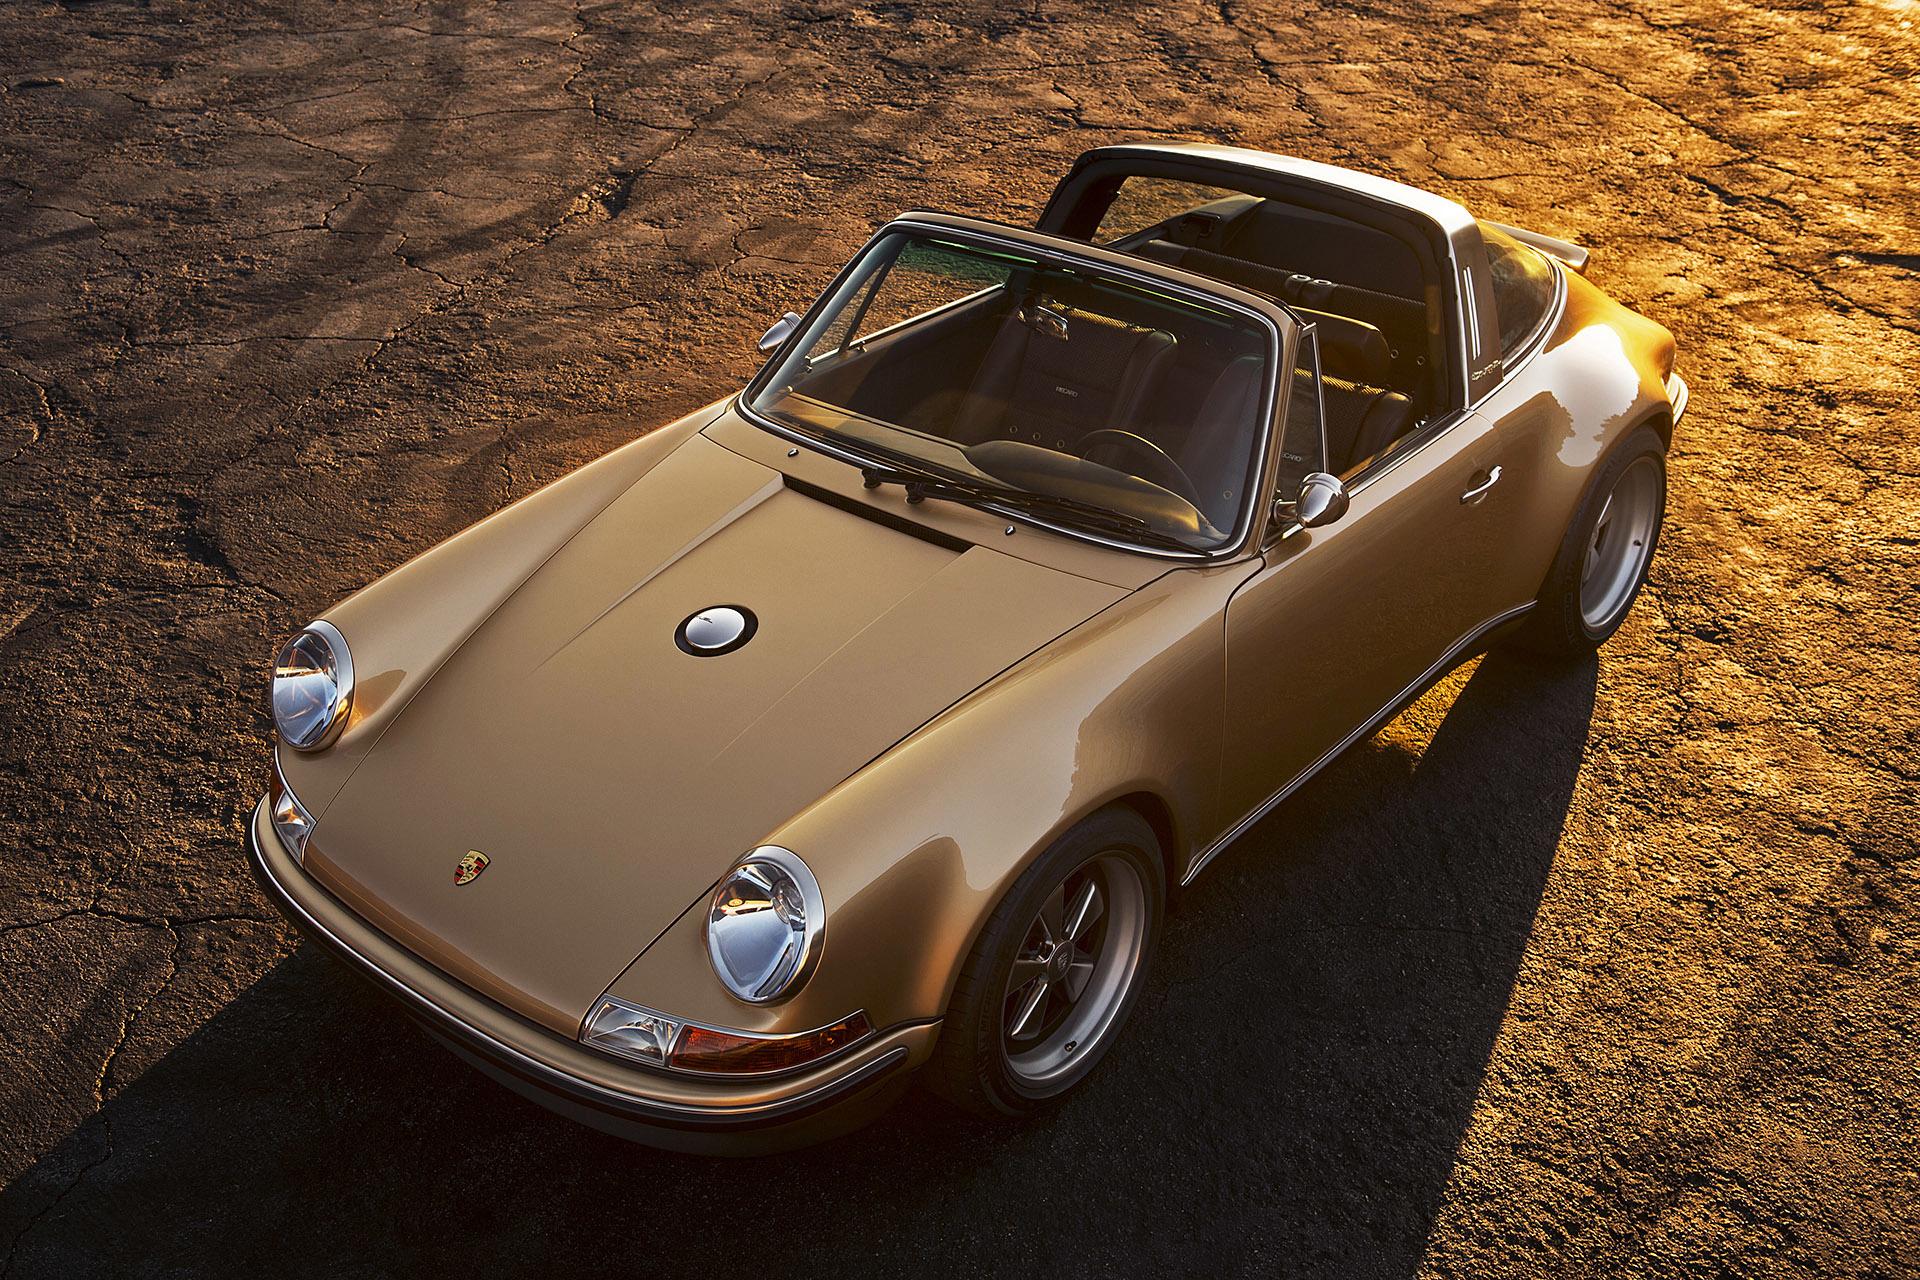 Porsche-911-Targa-Reimagined-by-Singer-3